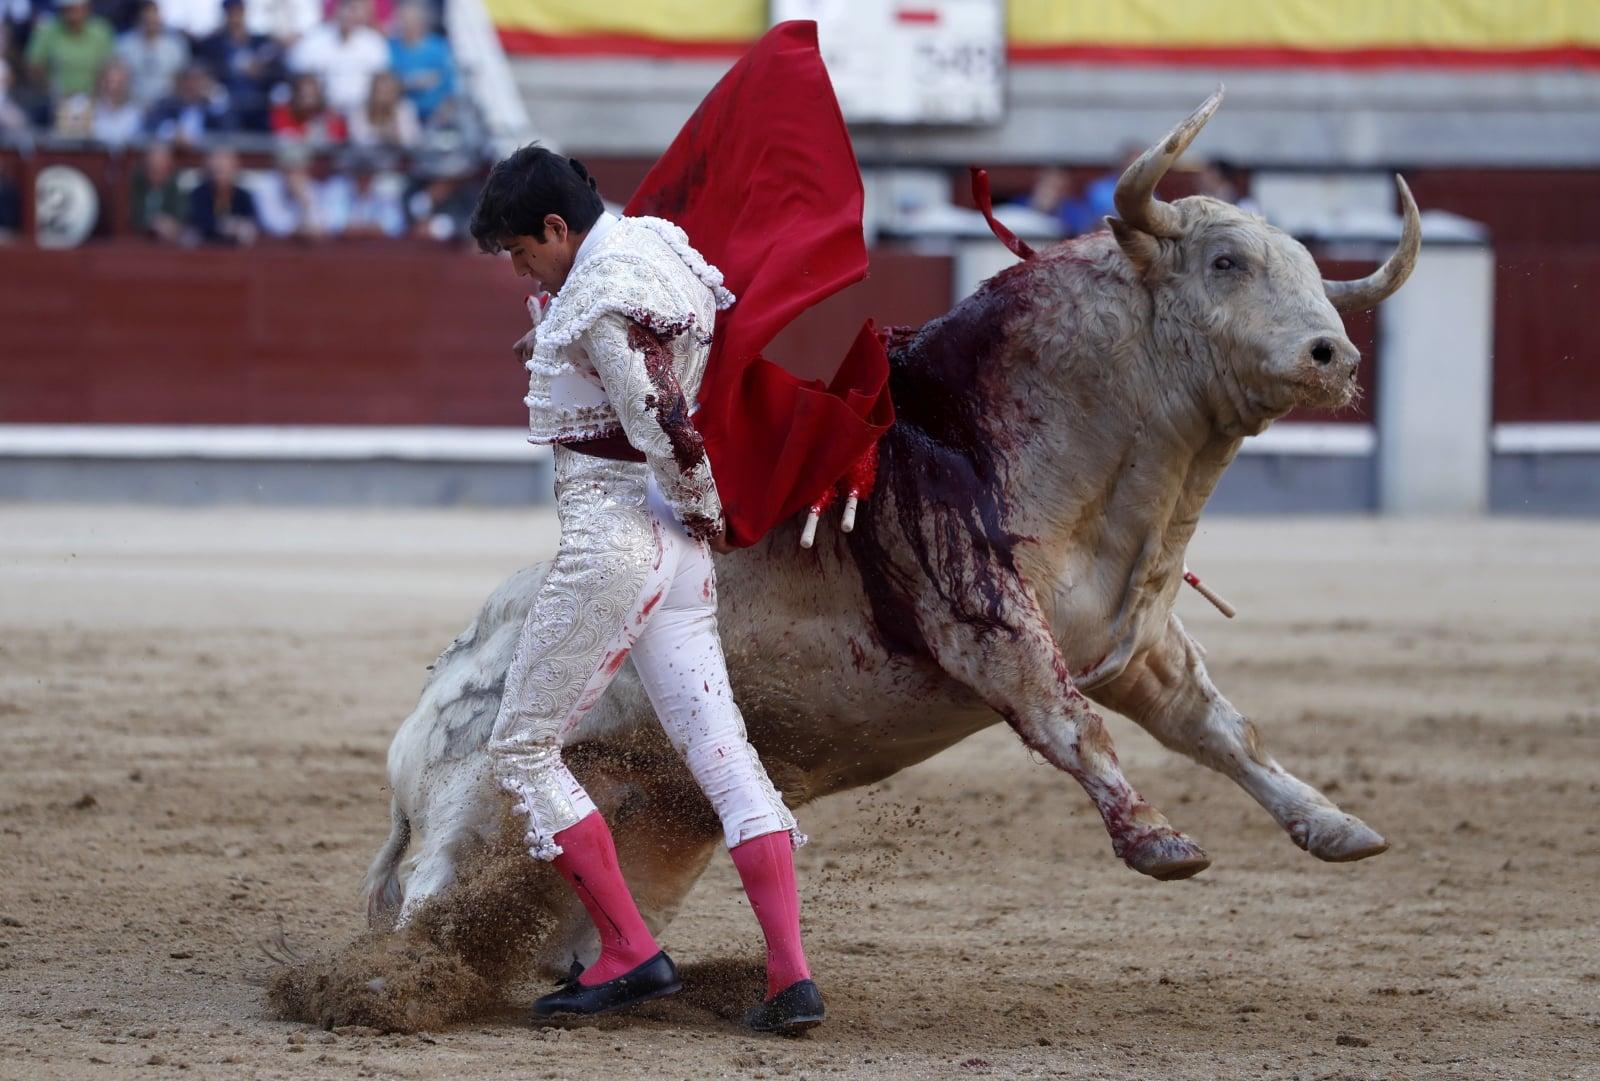 Walka z bykami fot. EPA/Javier Lizon